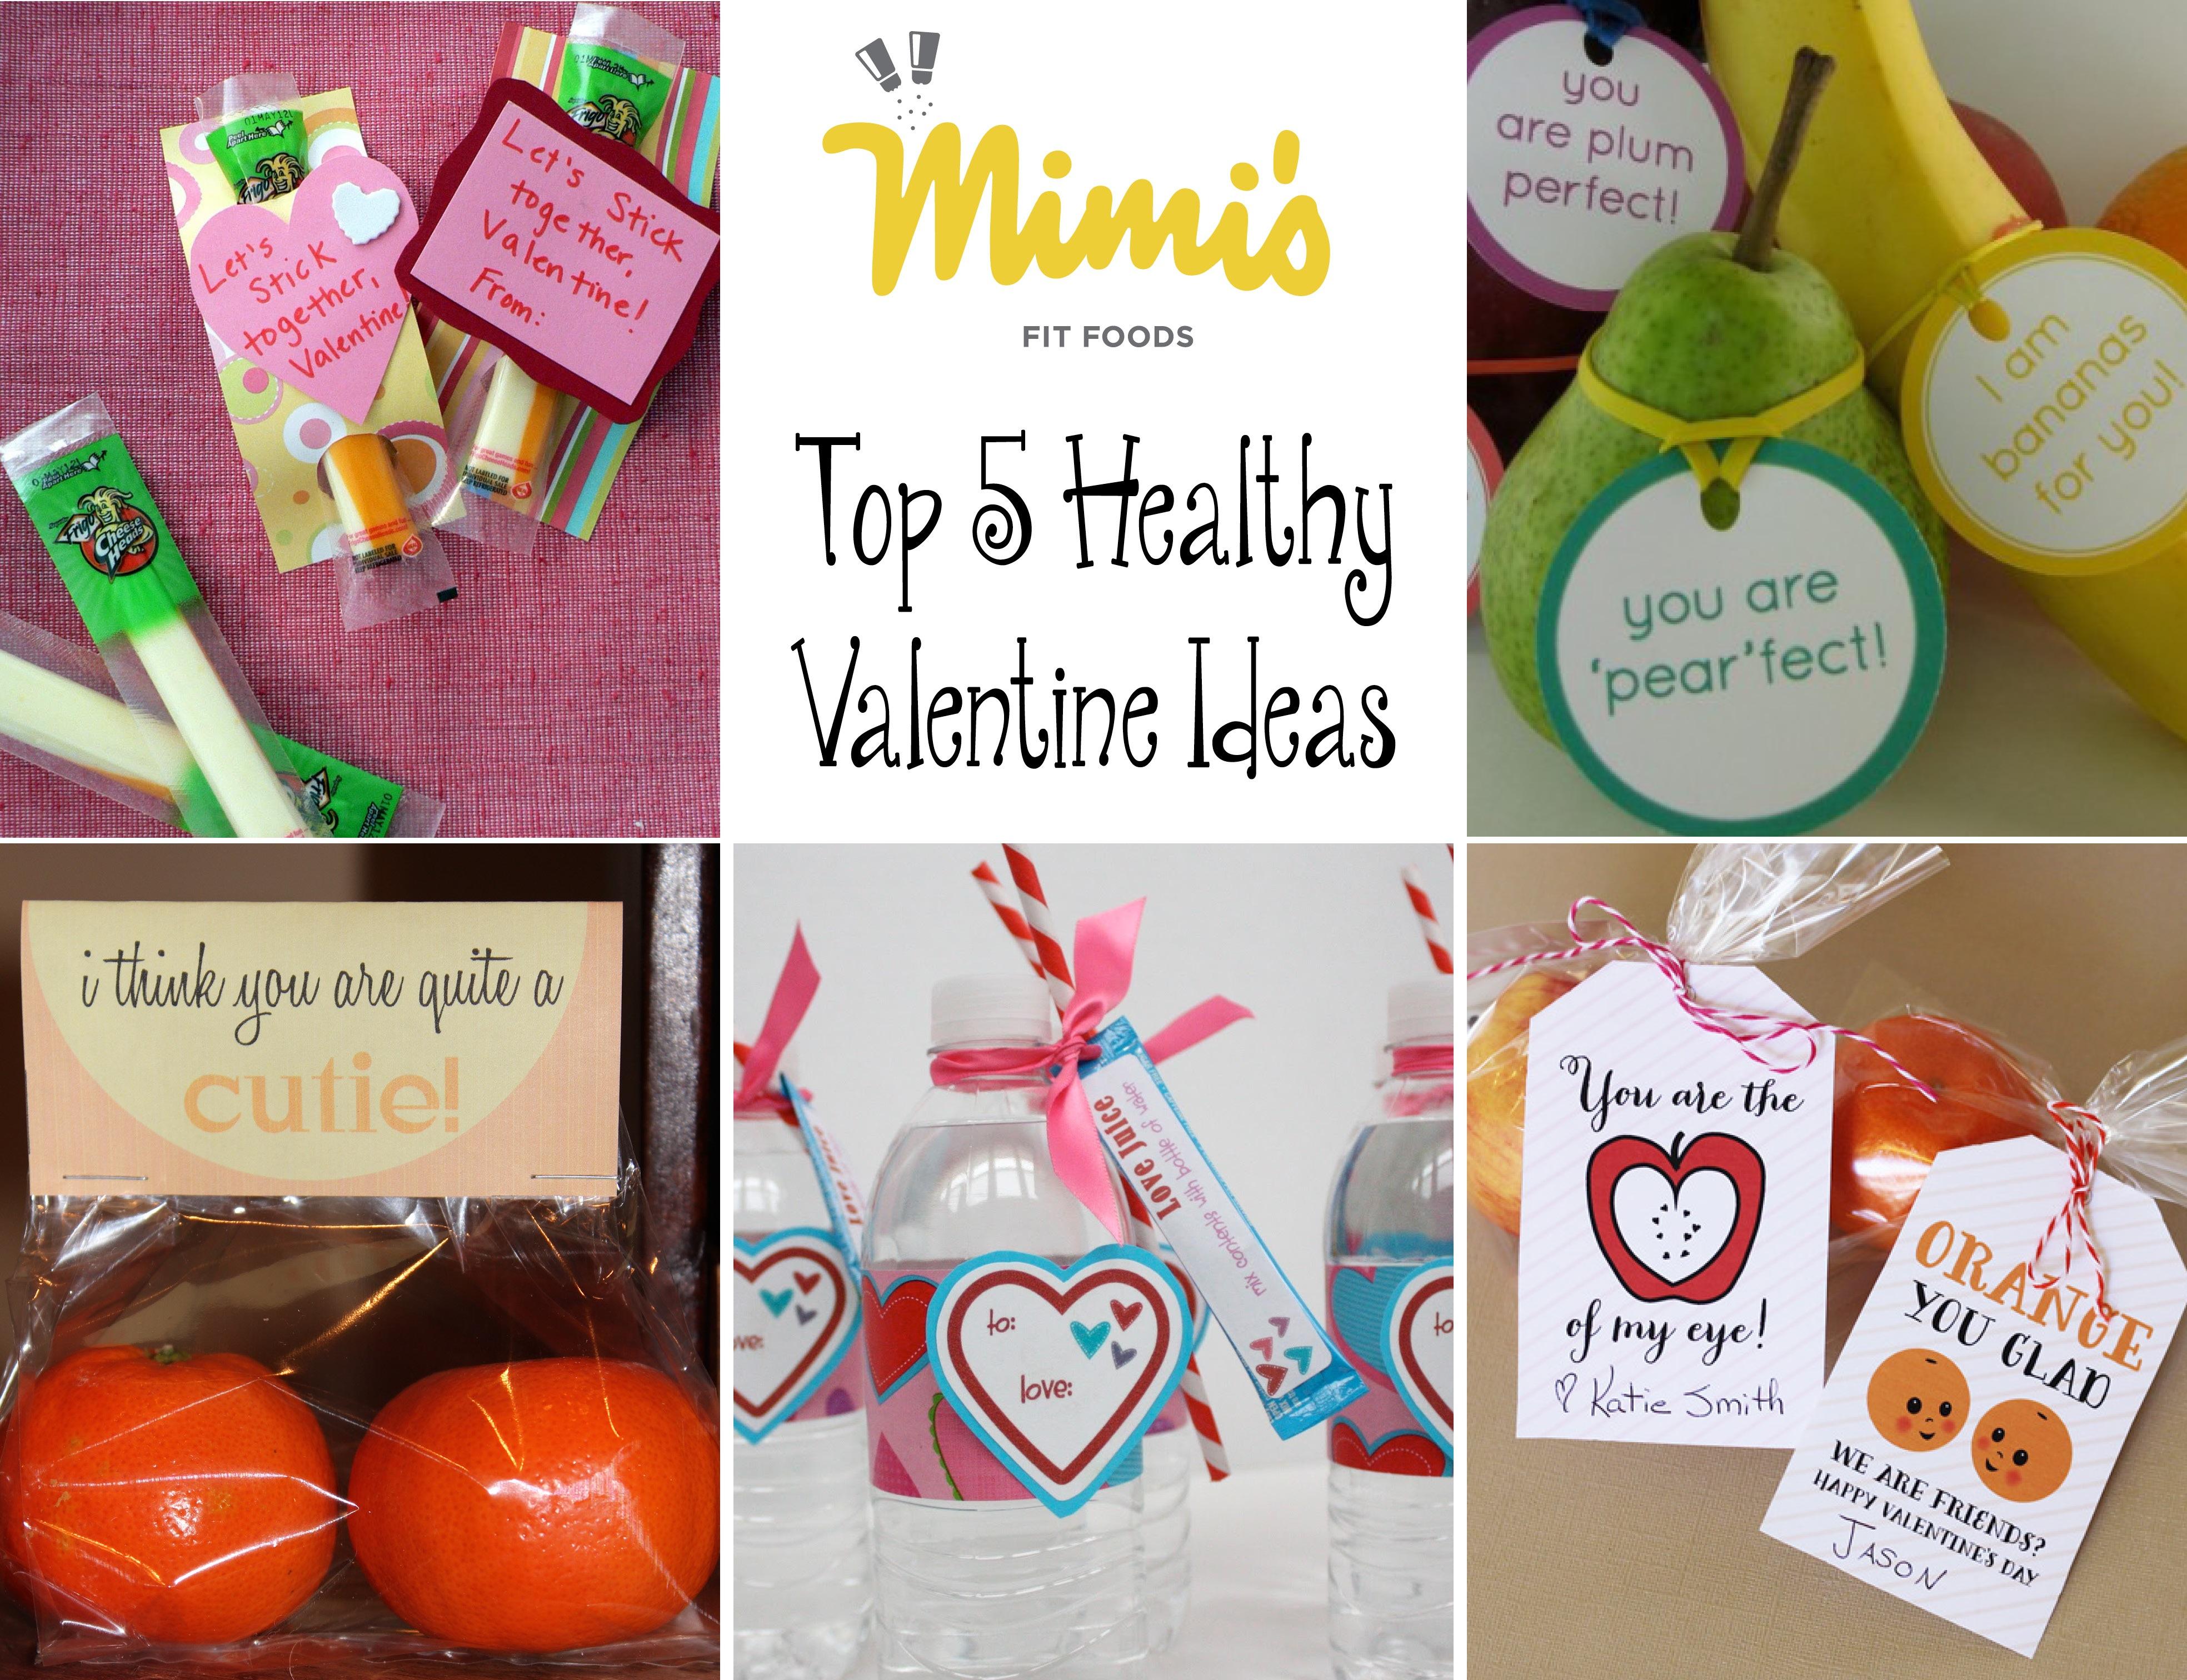 Top 5 Healthy Valentine Ideas   Mimiu0027s Fit Foods